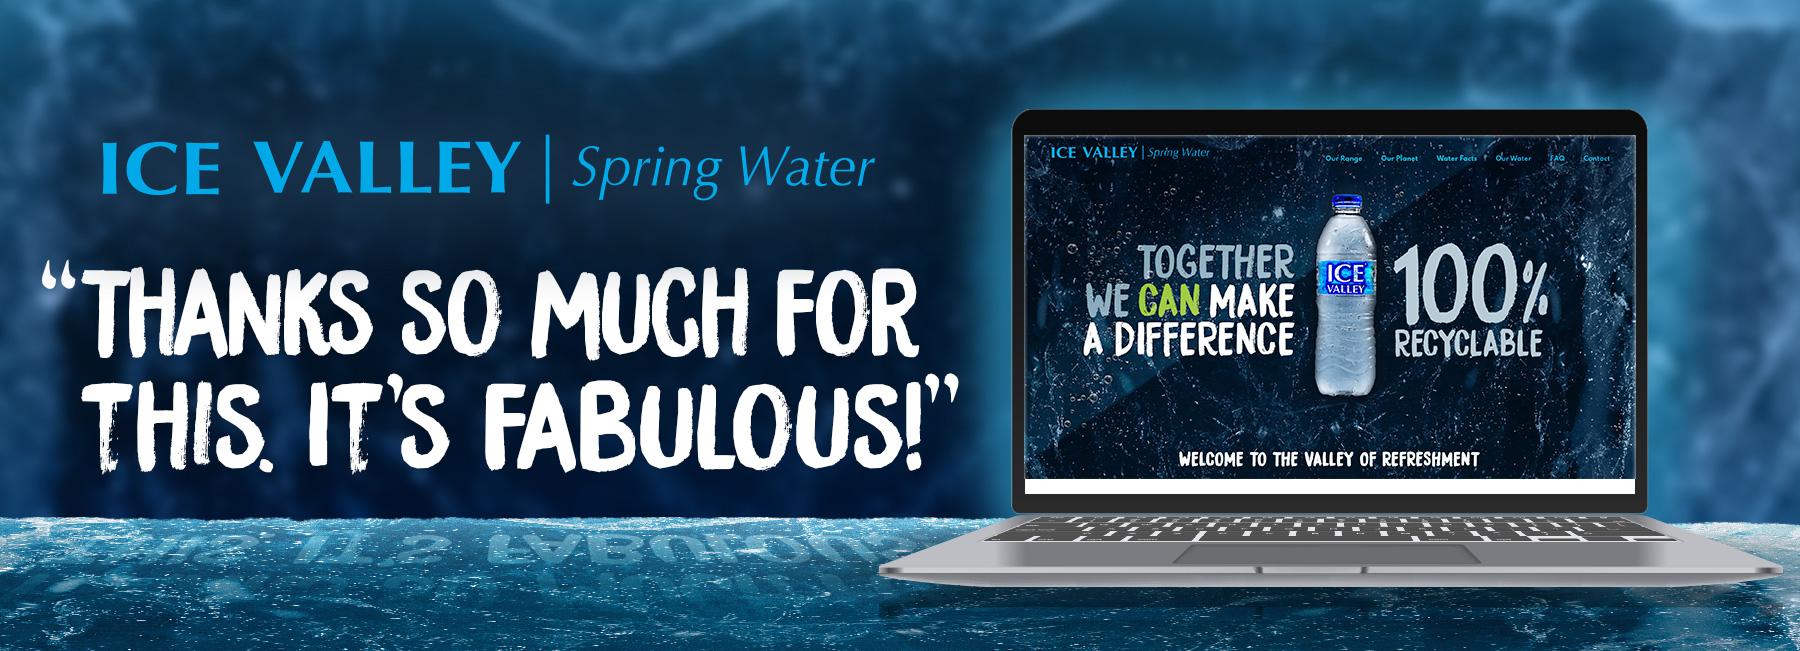 New ICE VALLEY Website